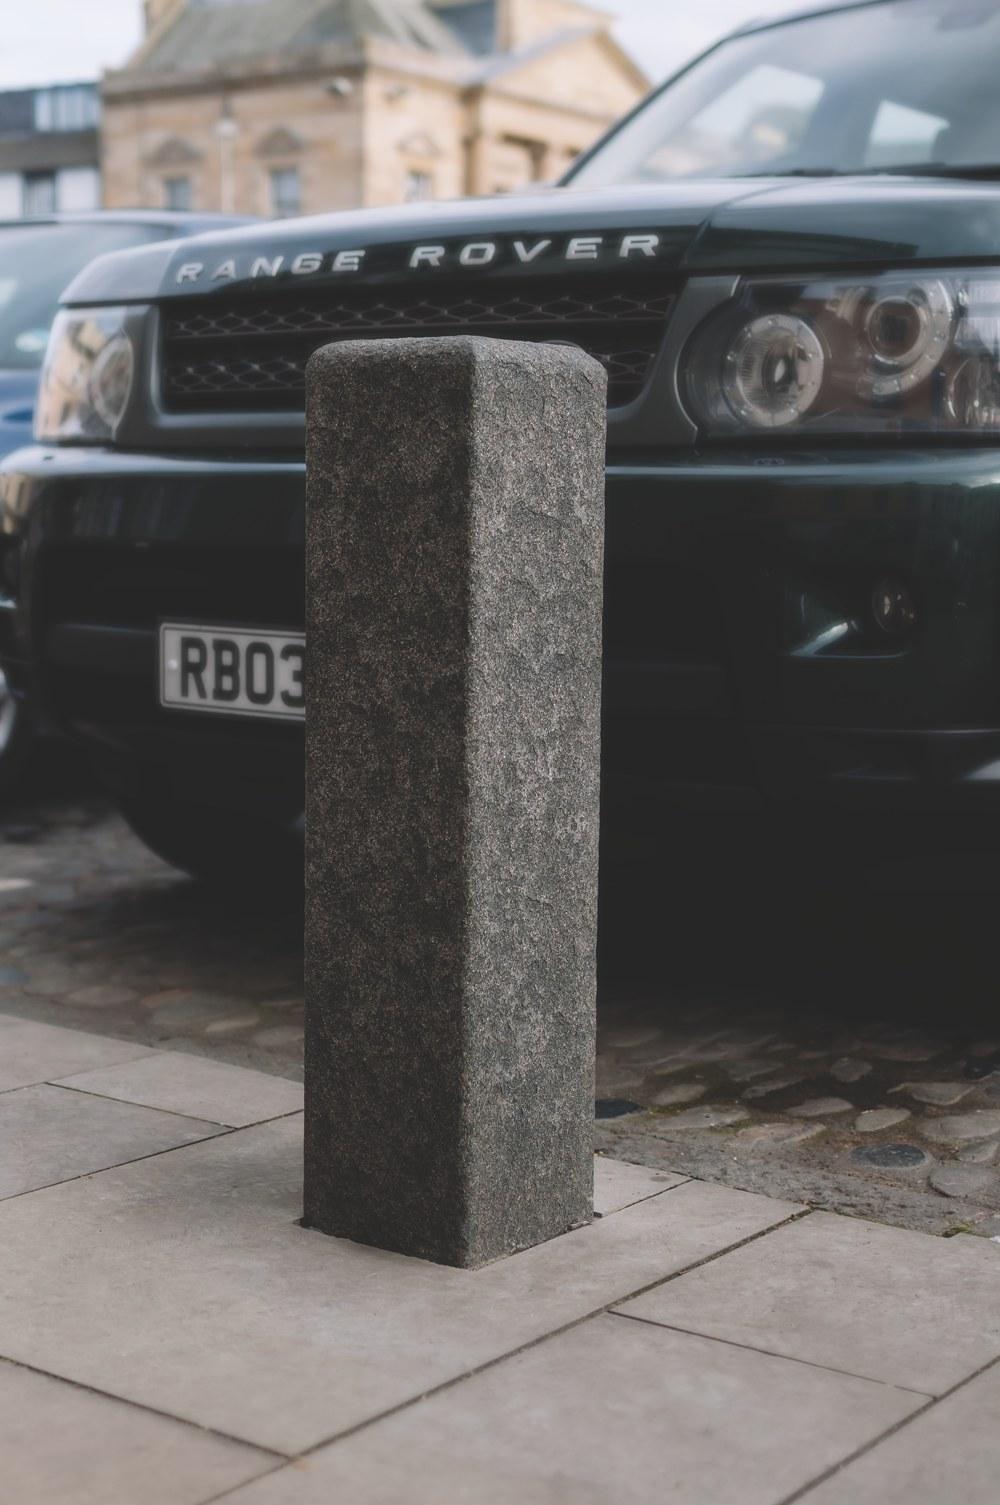 scottish.whin.stone.street.furniture.suppliers.tradstocks.public.realm.traffic.calming.parking.bollard.jpg